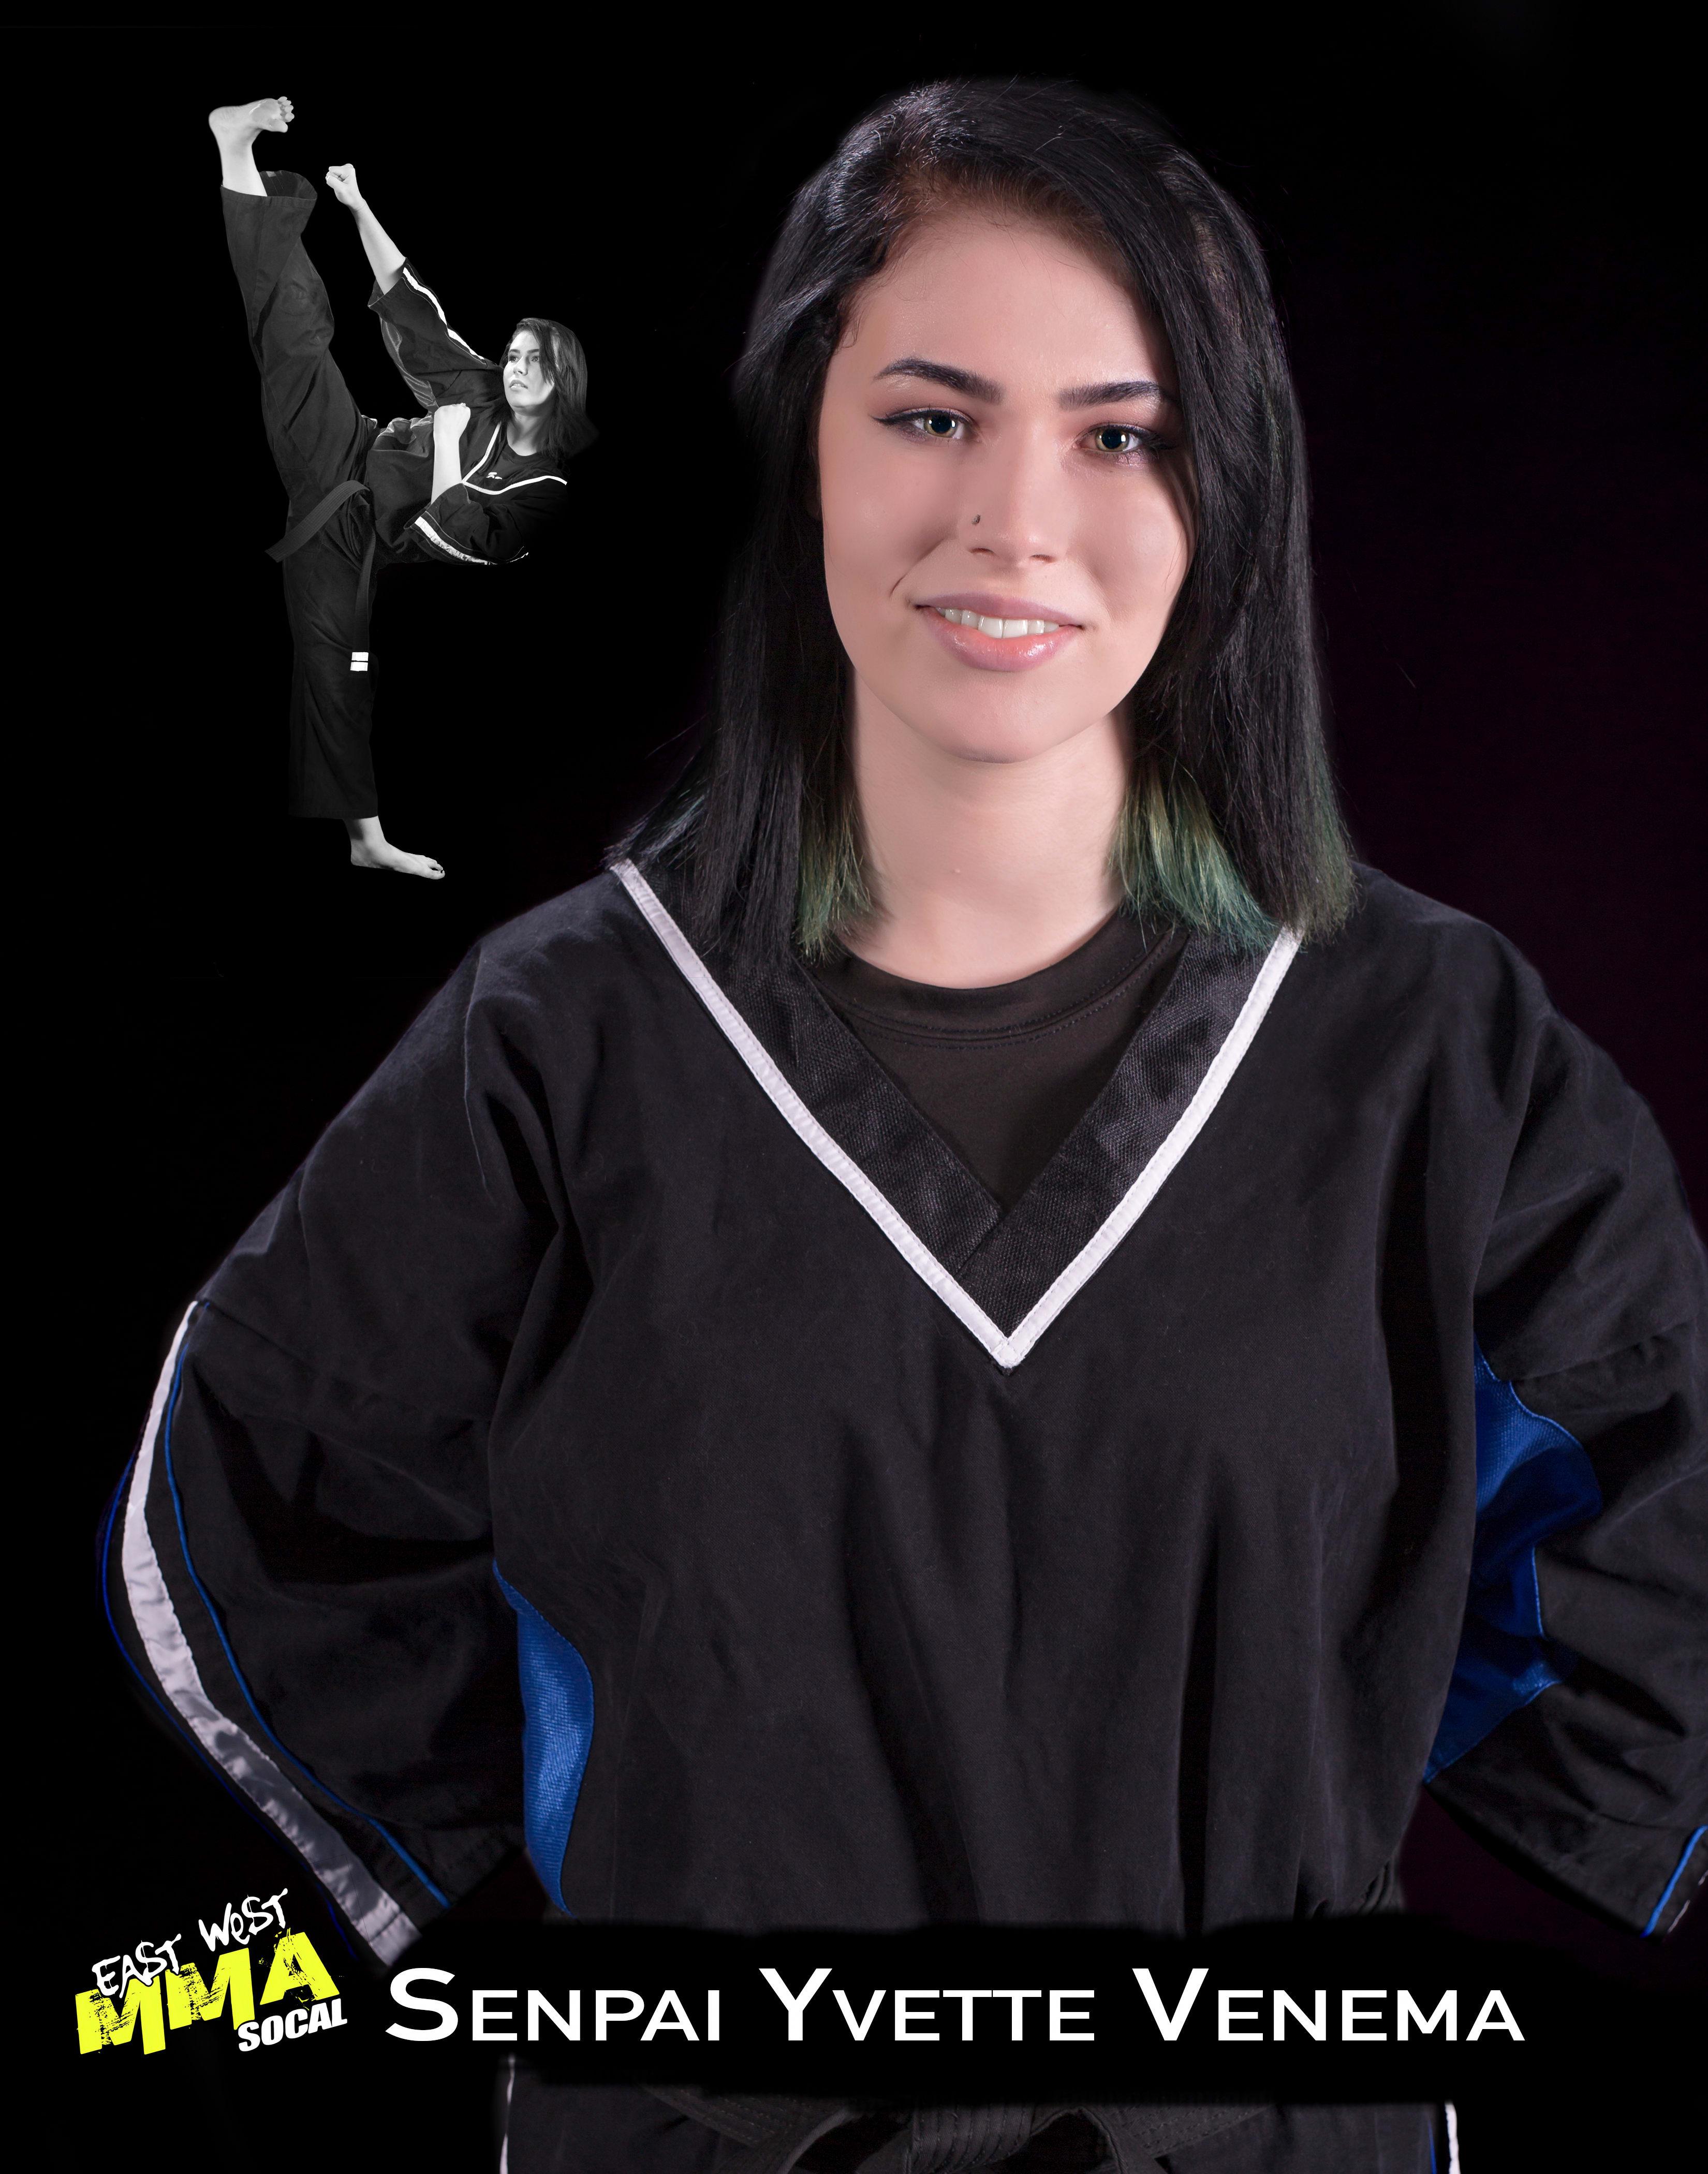 Senpai Yvette in Escondido - East West MMA SoCal